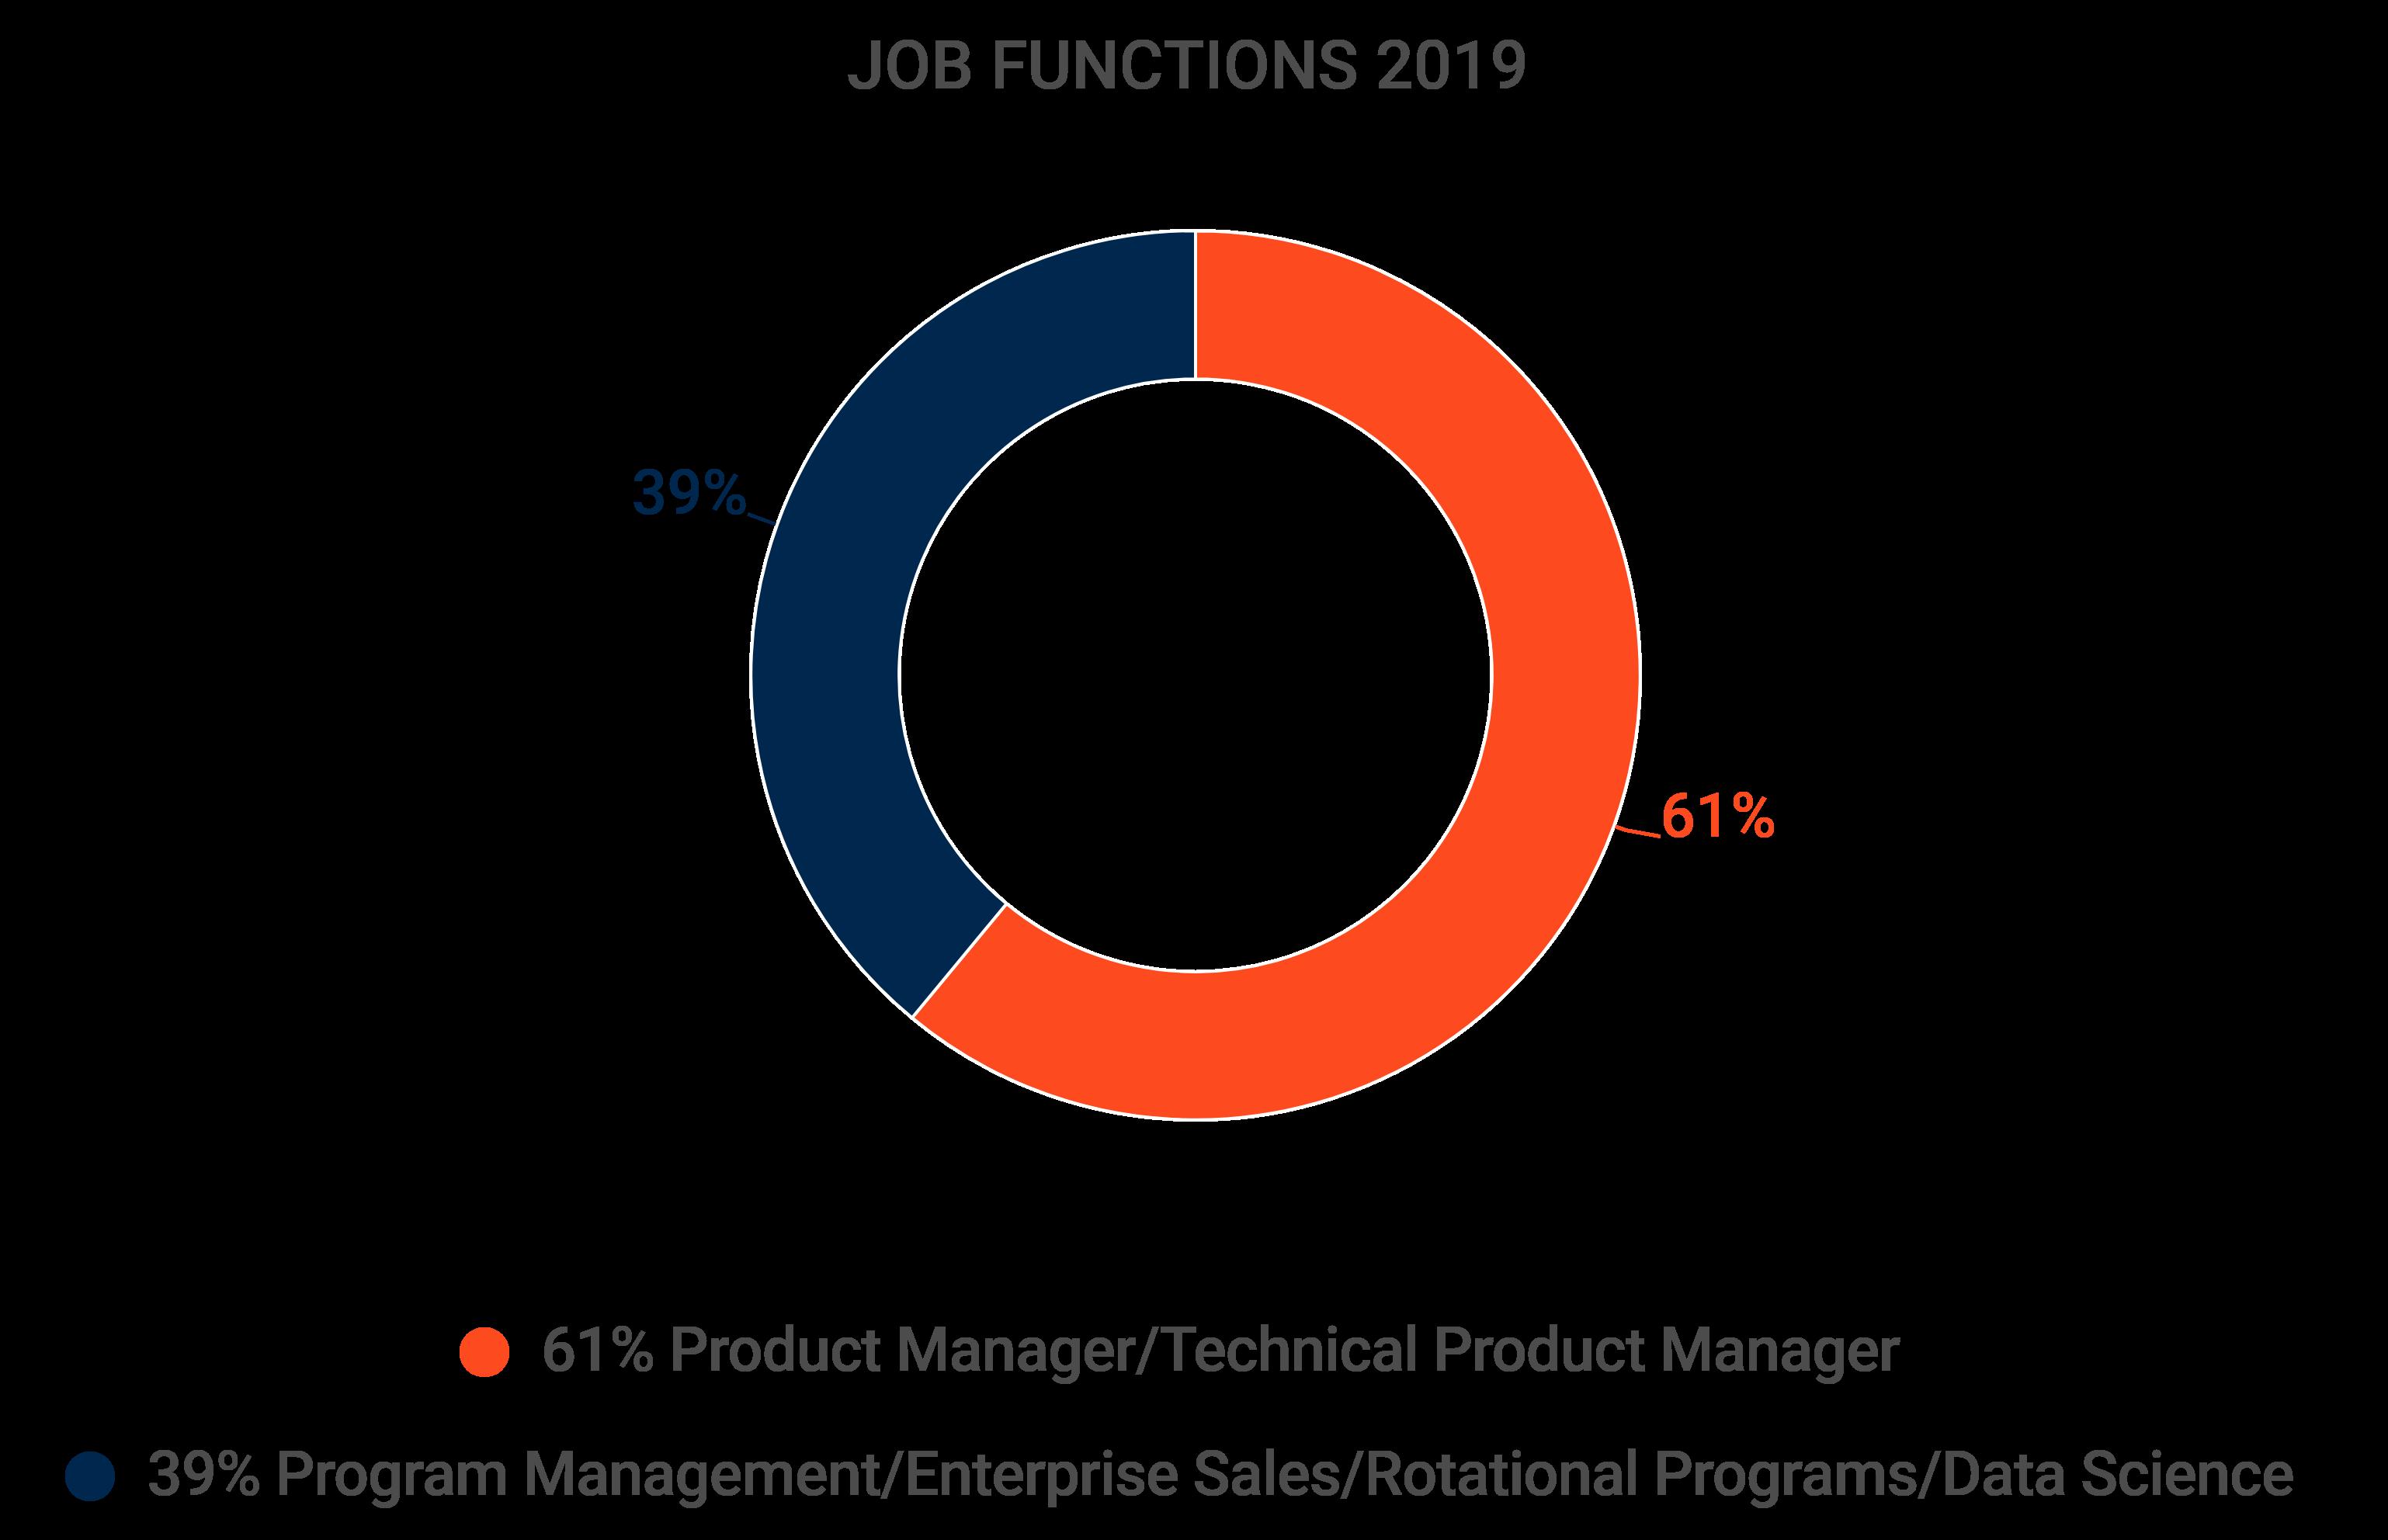 Circle-chart; Job Functions 2019: 61% Product Manager/Technical Product Manager and 39% Program Management/Enterprise Sales/Rotational Programs/Data Science